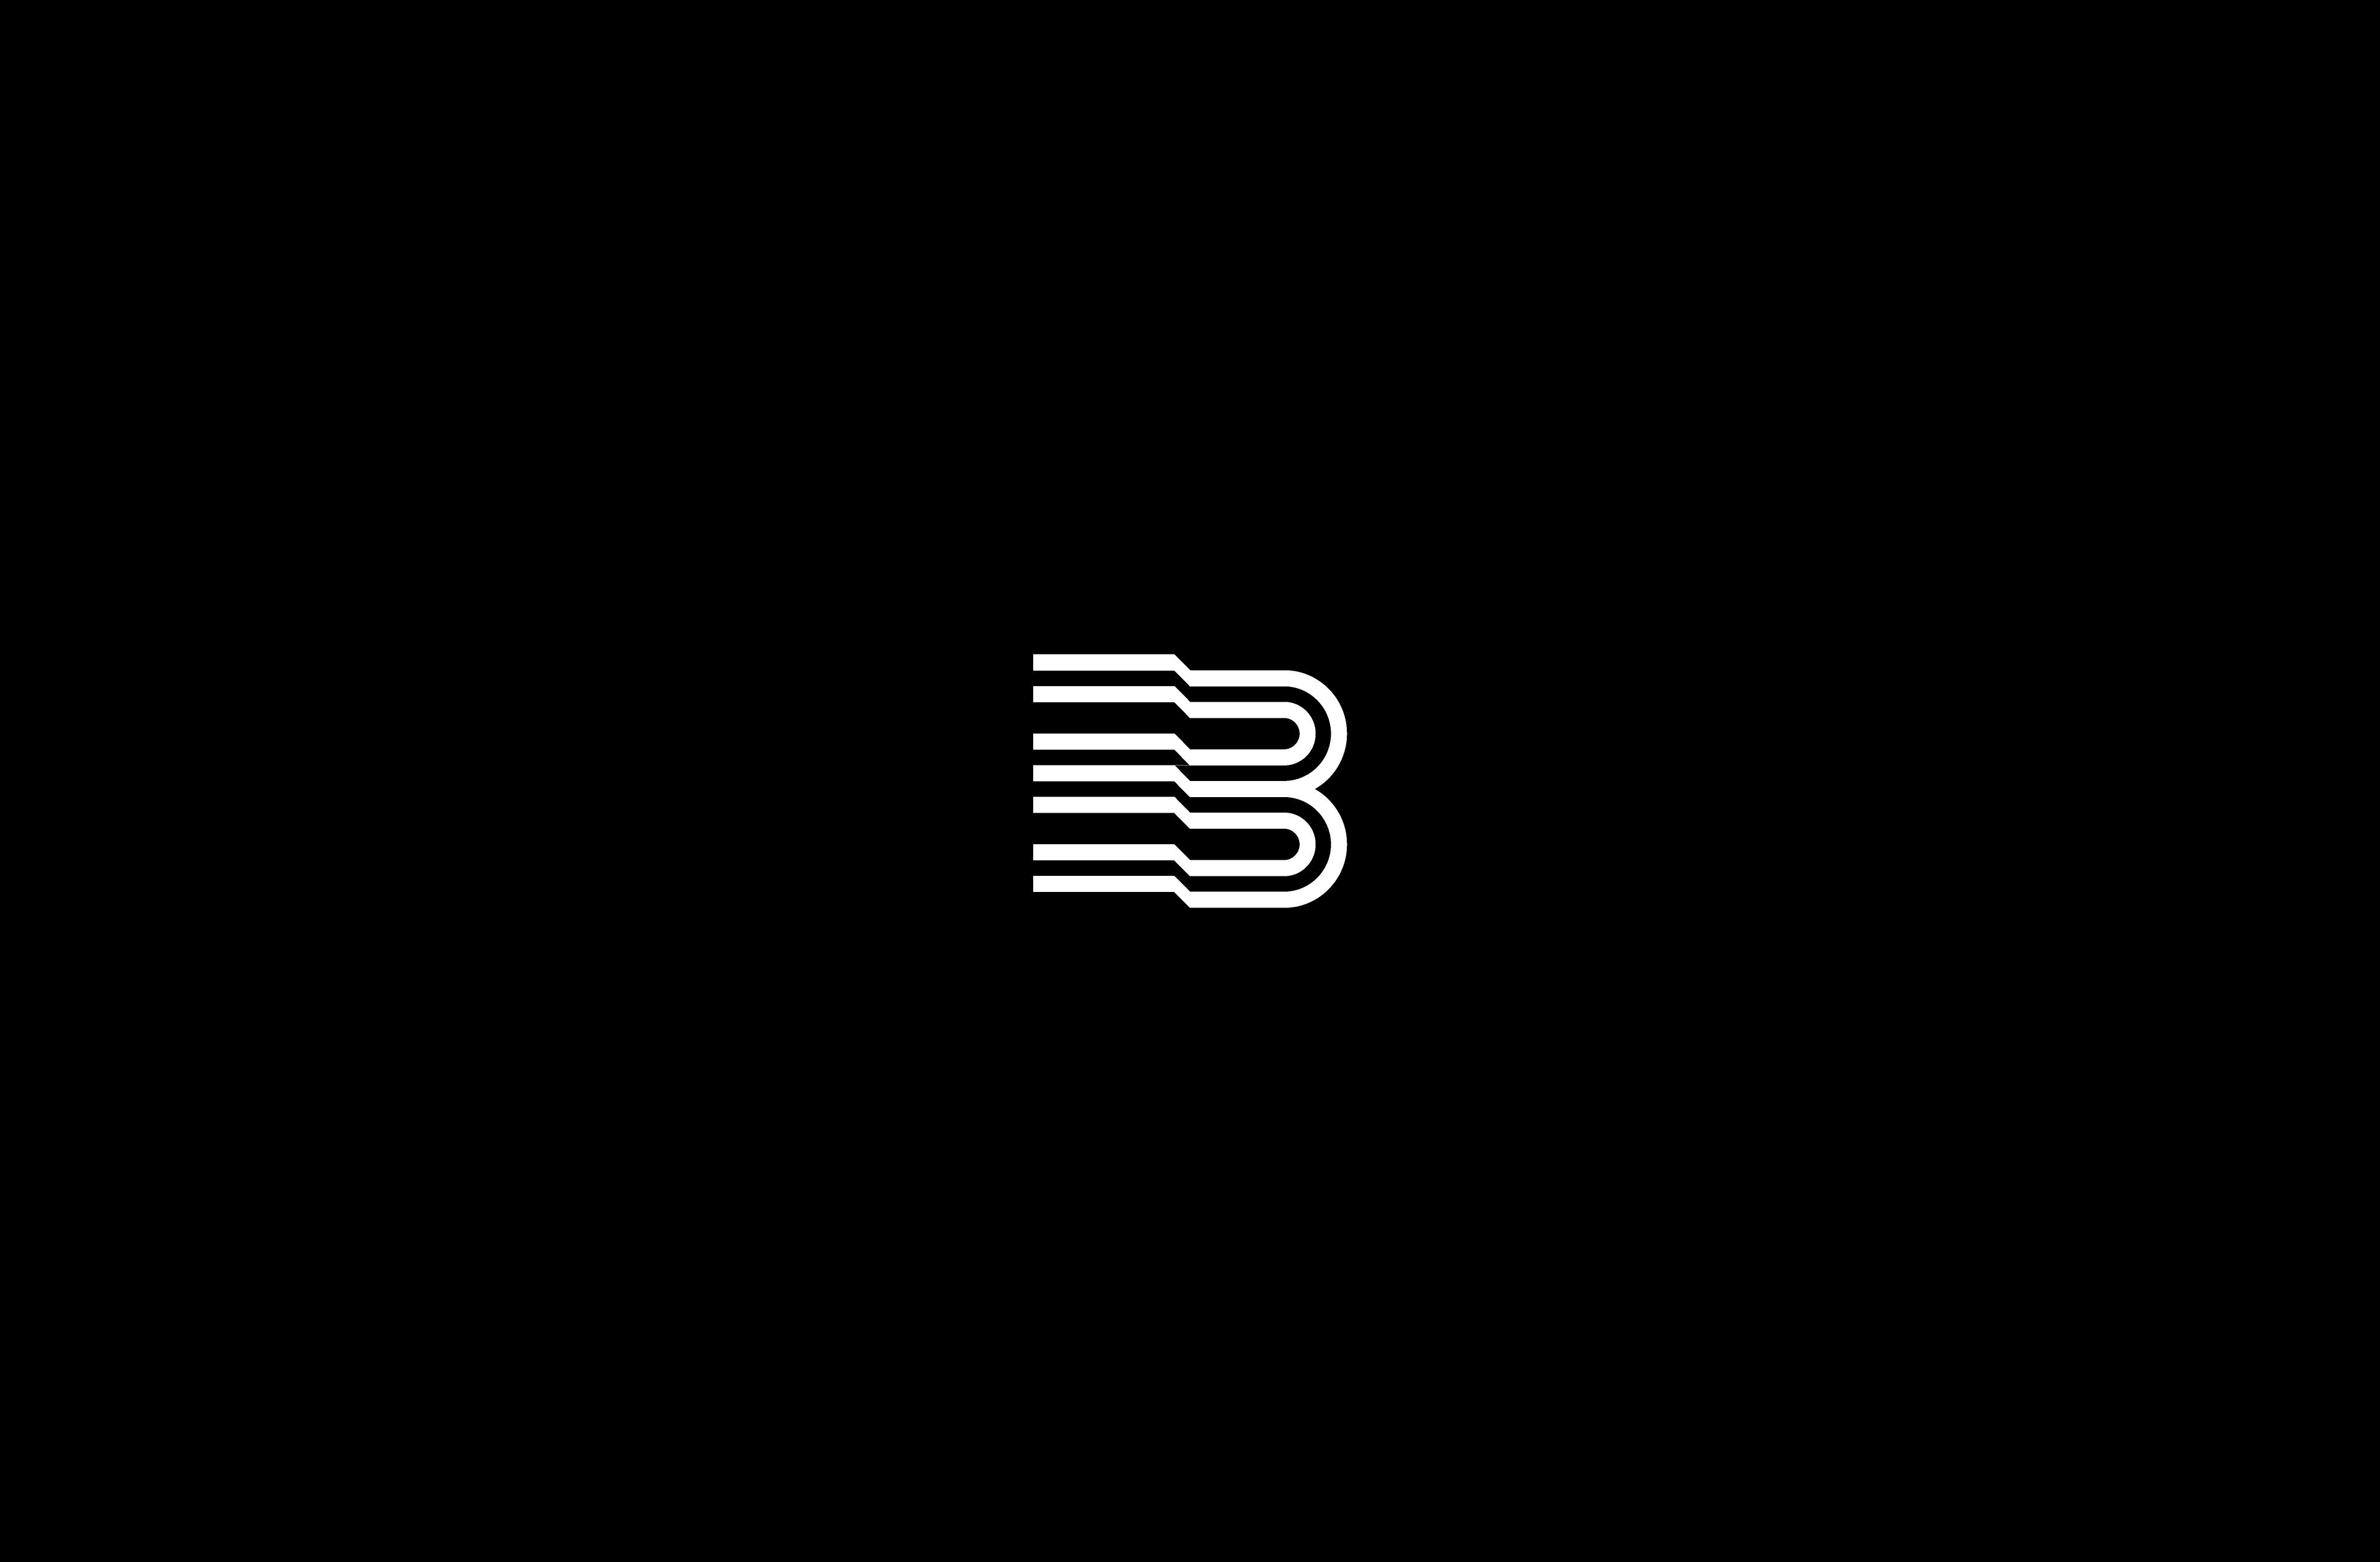 Logo-BW-2x